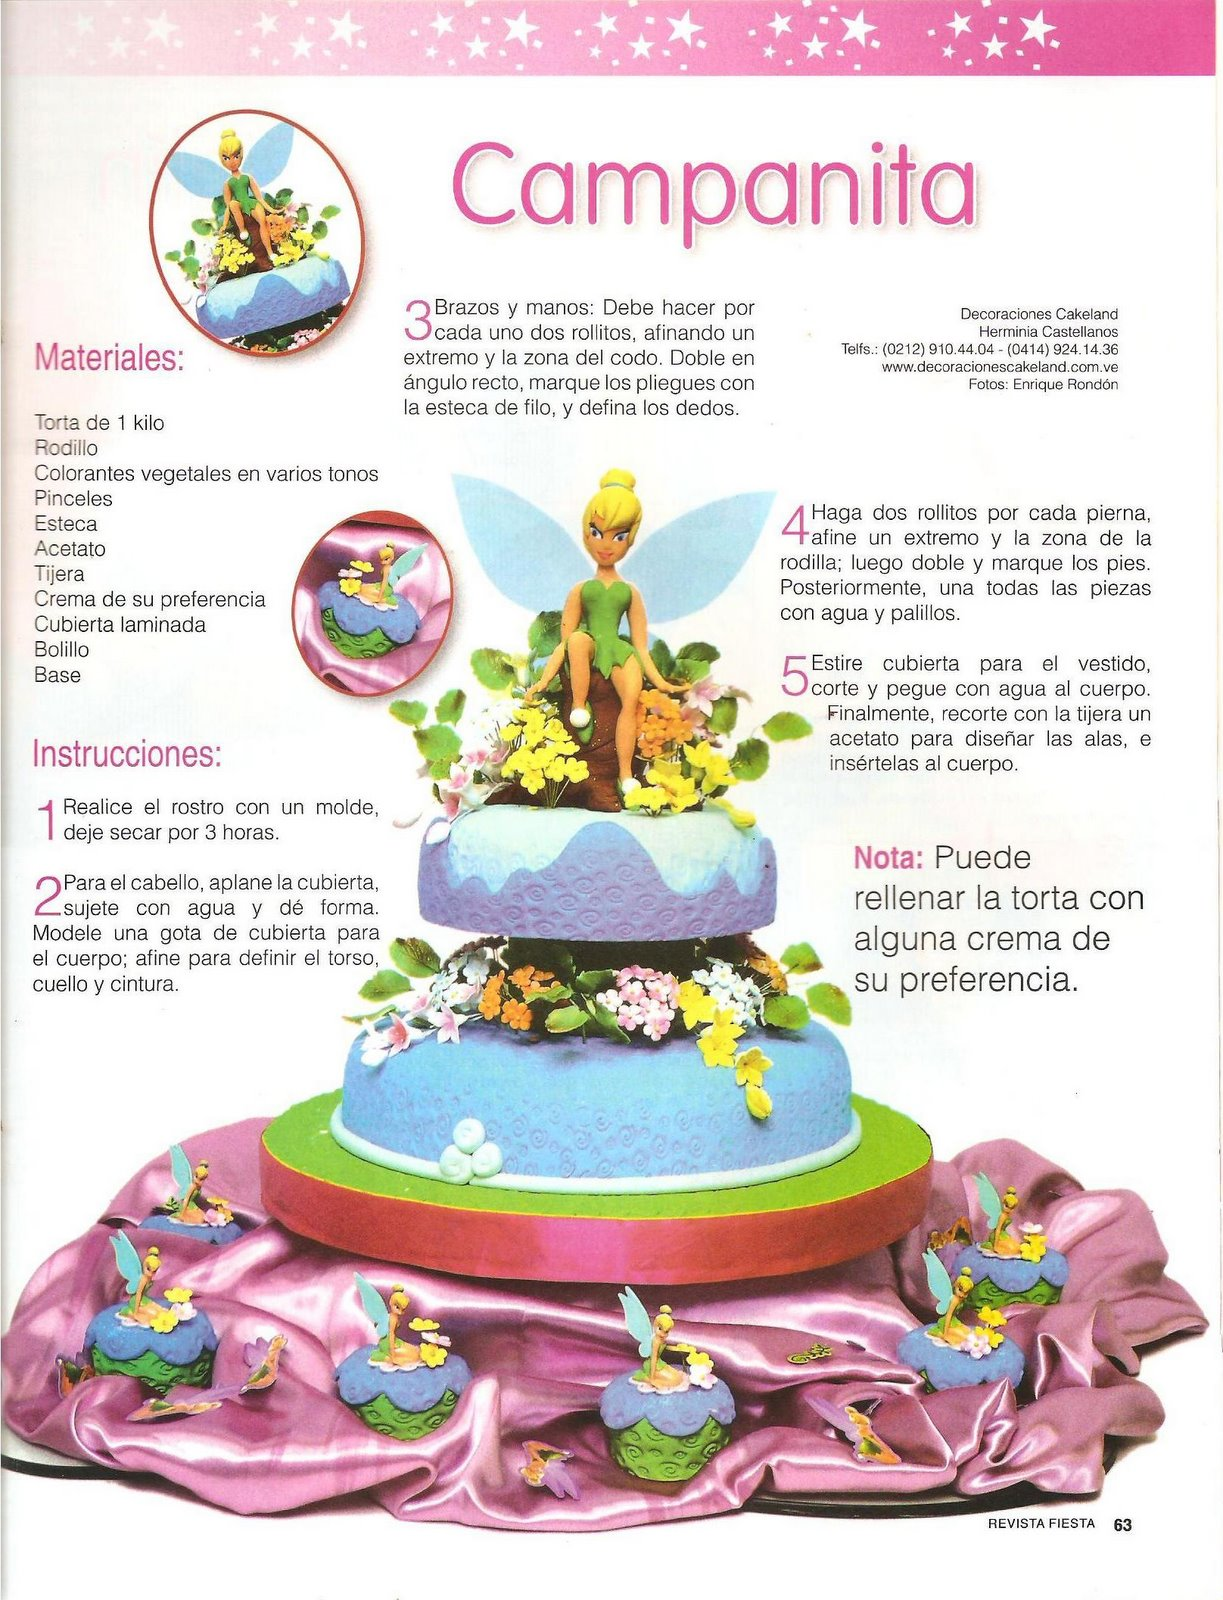 Moldes de: *♥* Campanita , *♥* Pasteles